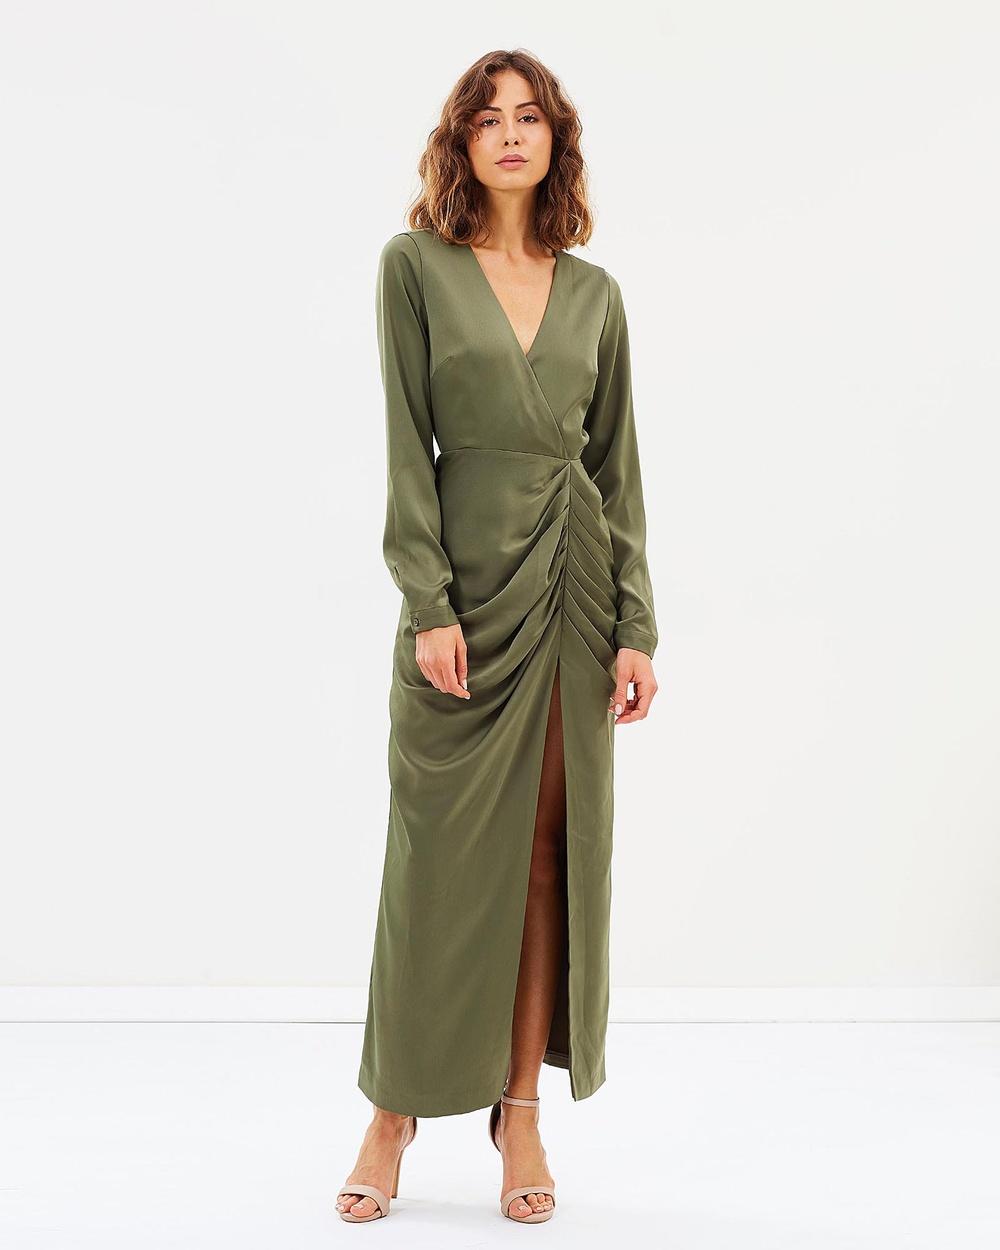 Friend of Audrey Valerie Thigh Split Dress Dresses Olive Valerie Thigh Split Dress